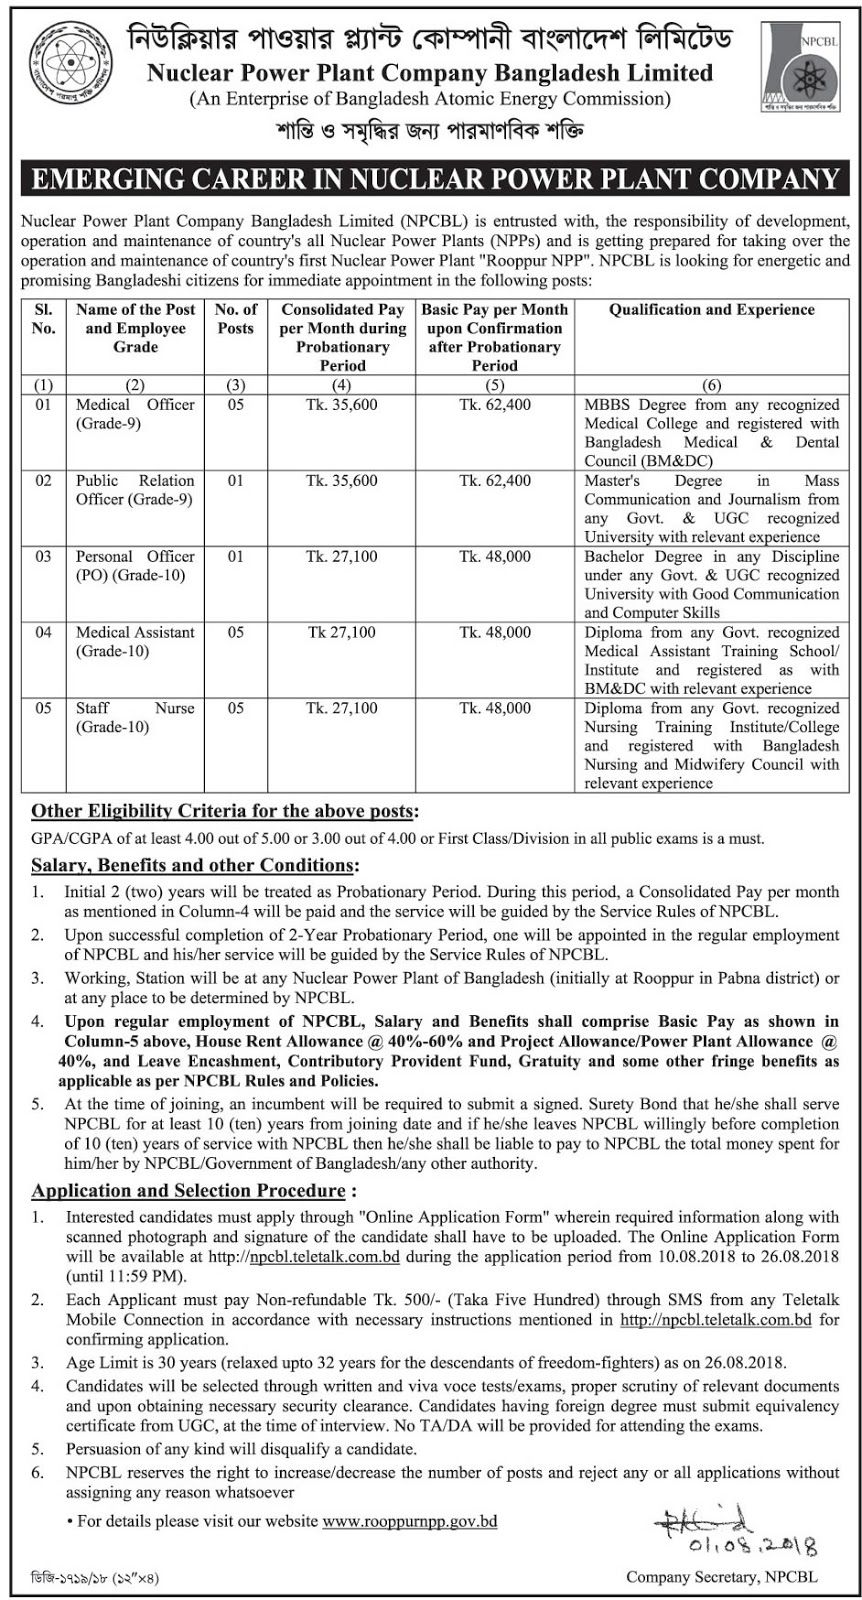 007 Nuclear Power Plant Company Bangladesh (NPCBL) Job